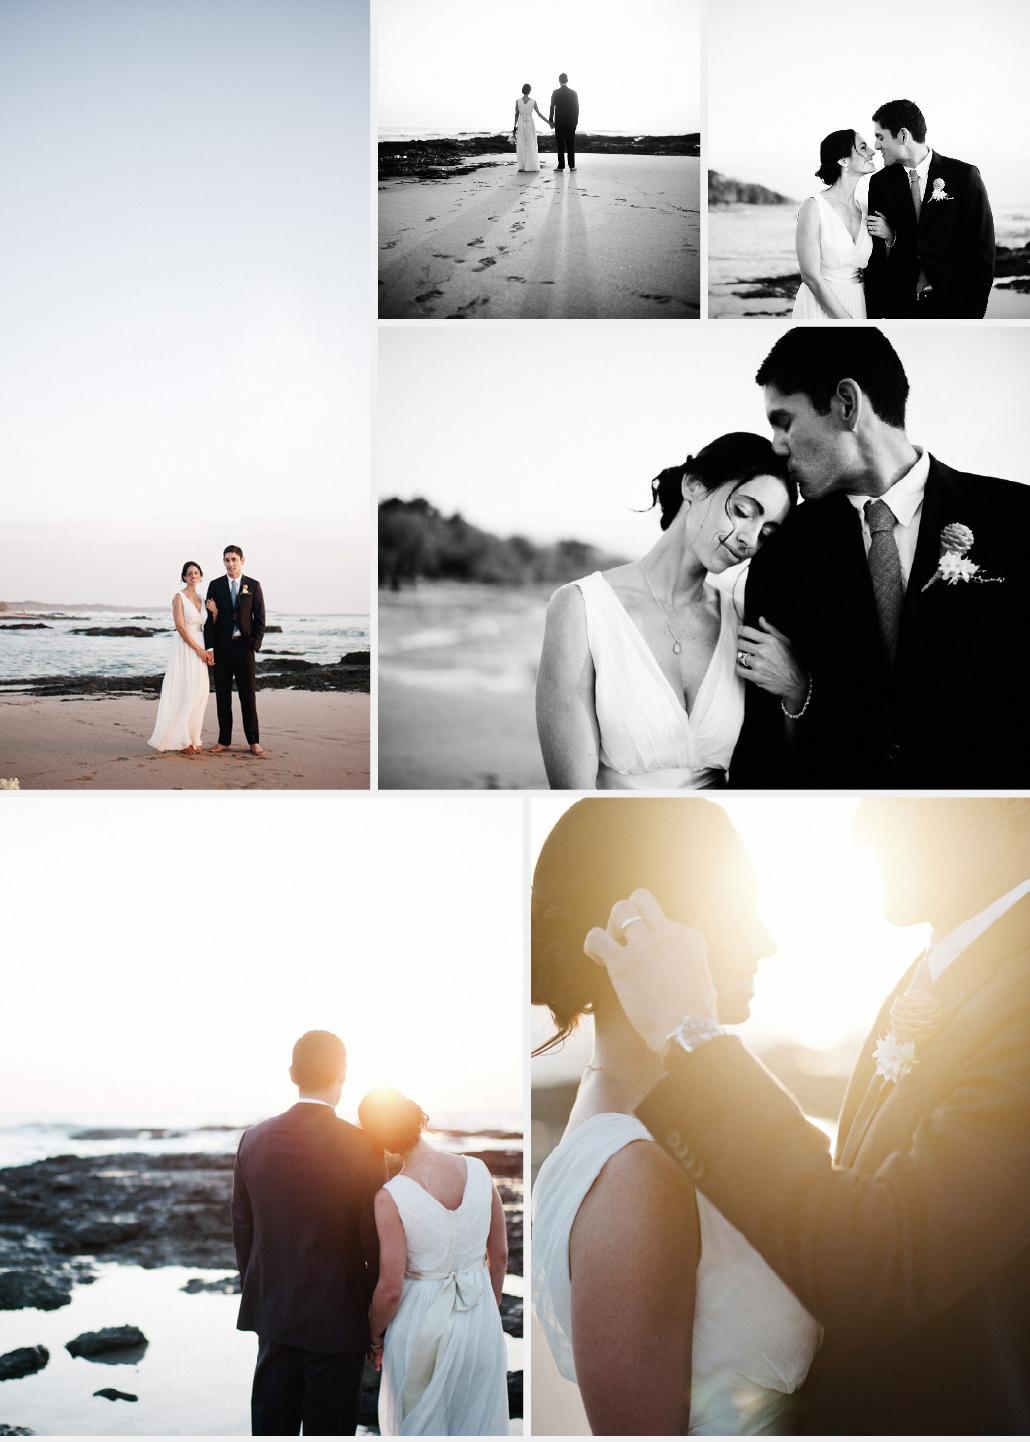 costa-rica-wedding-photographer-09.jpg